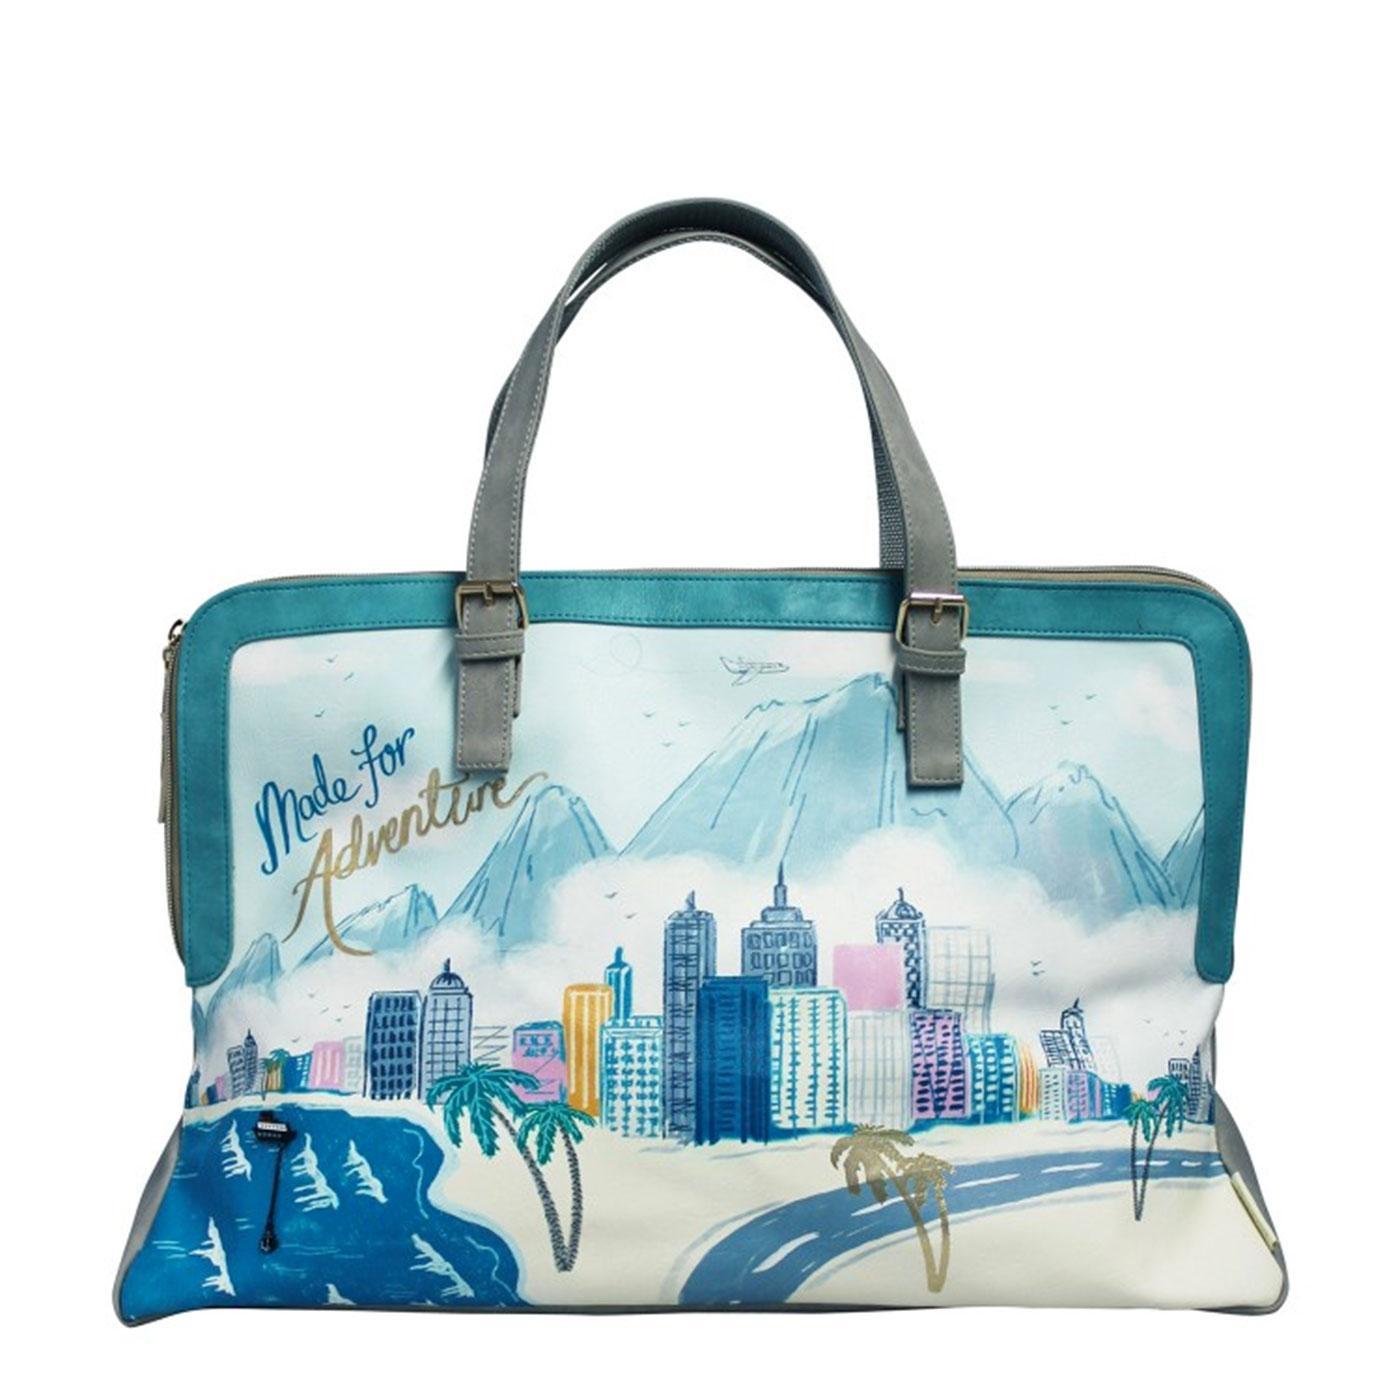 Made For Adventure Keepsake Overnight Travel Bag